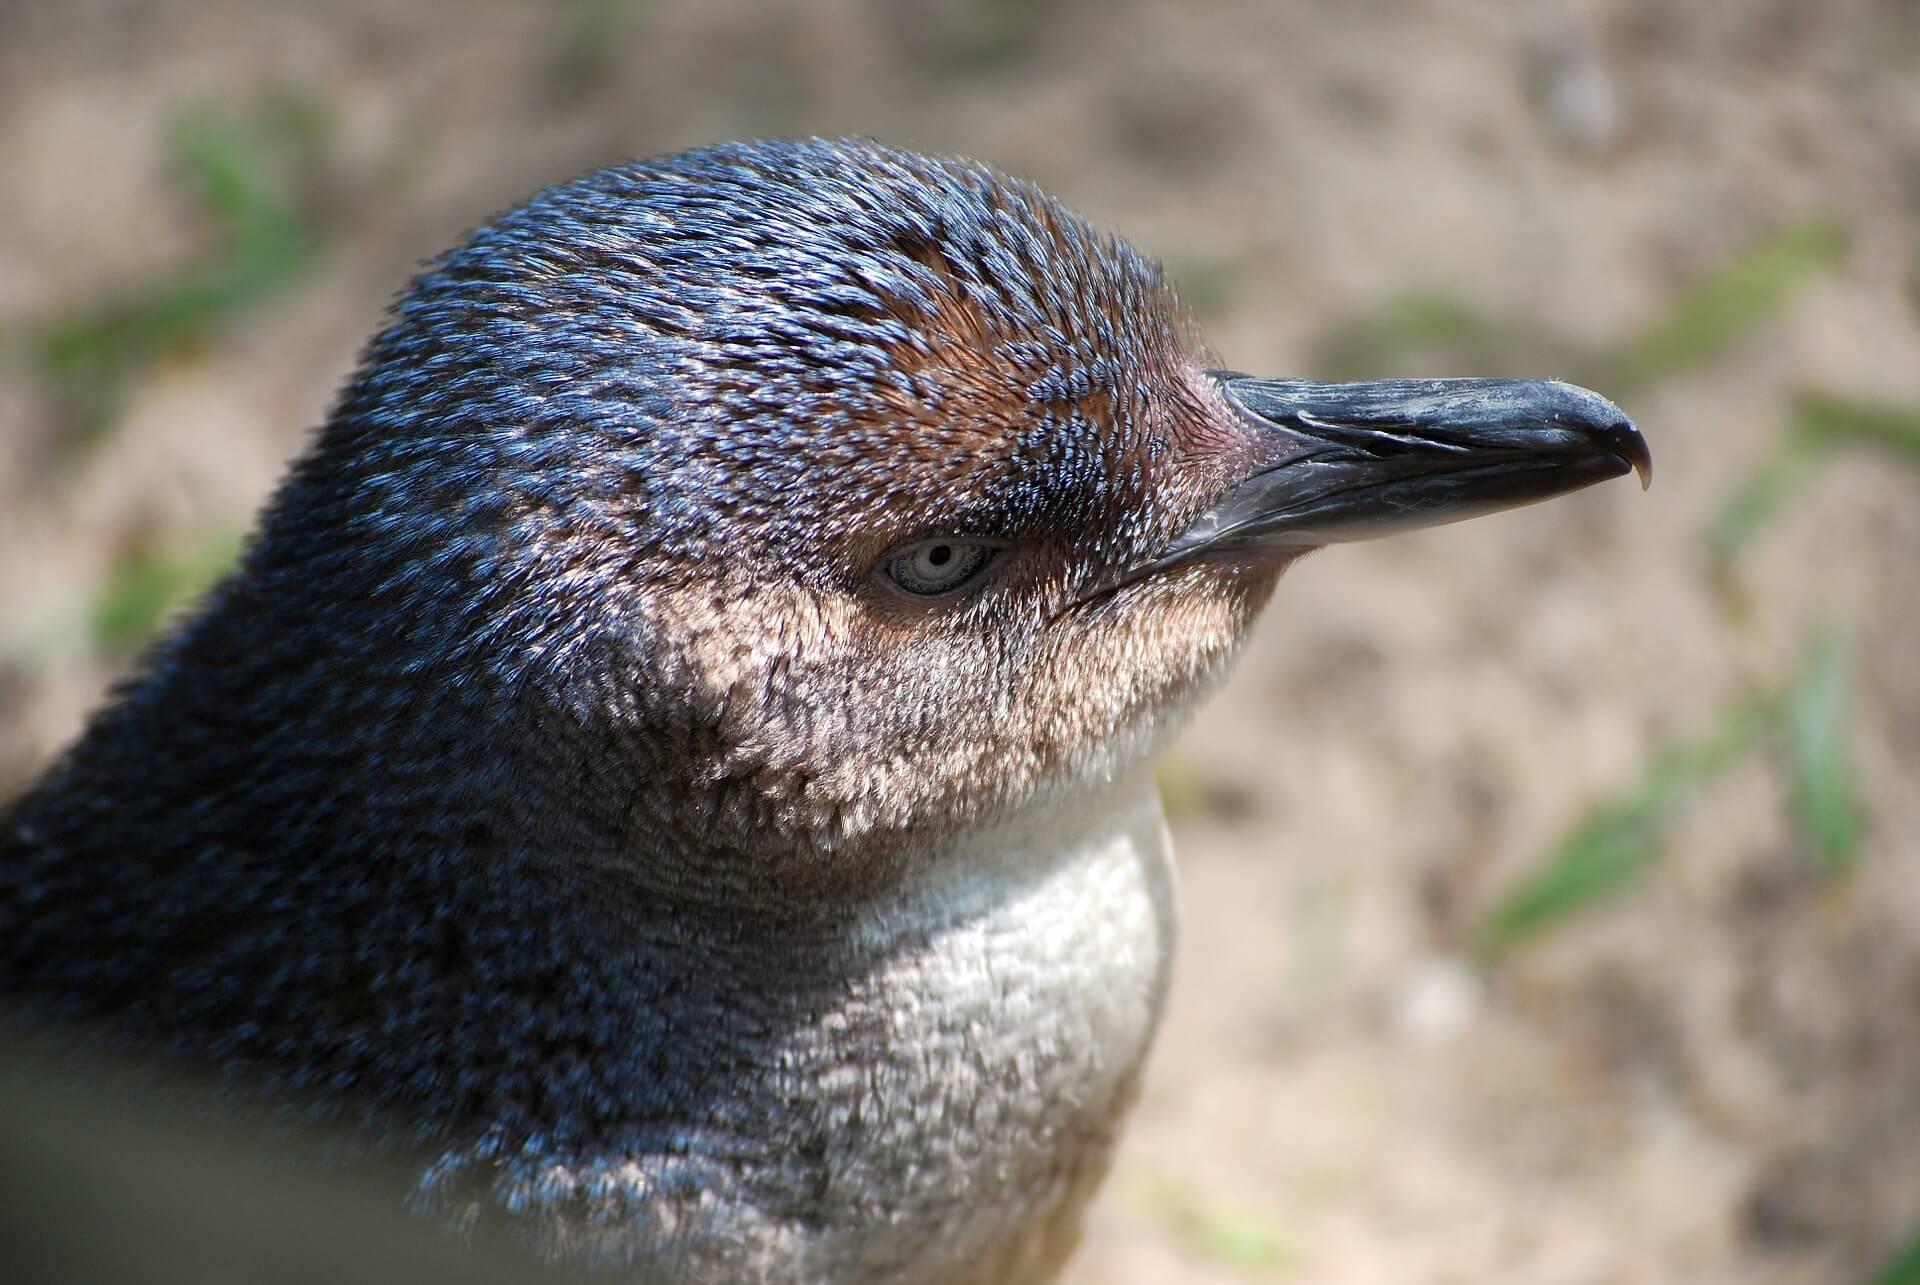 NZ Town Wins PETA Proggy Award For Penguin Passage